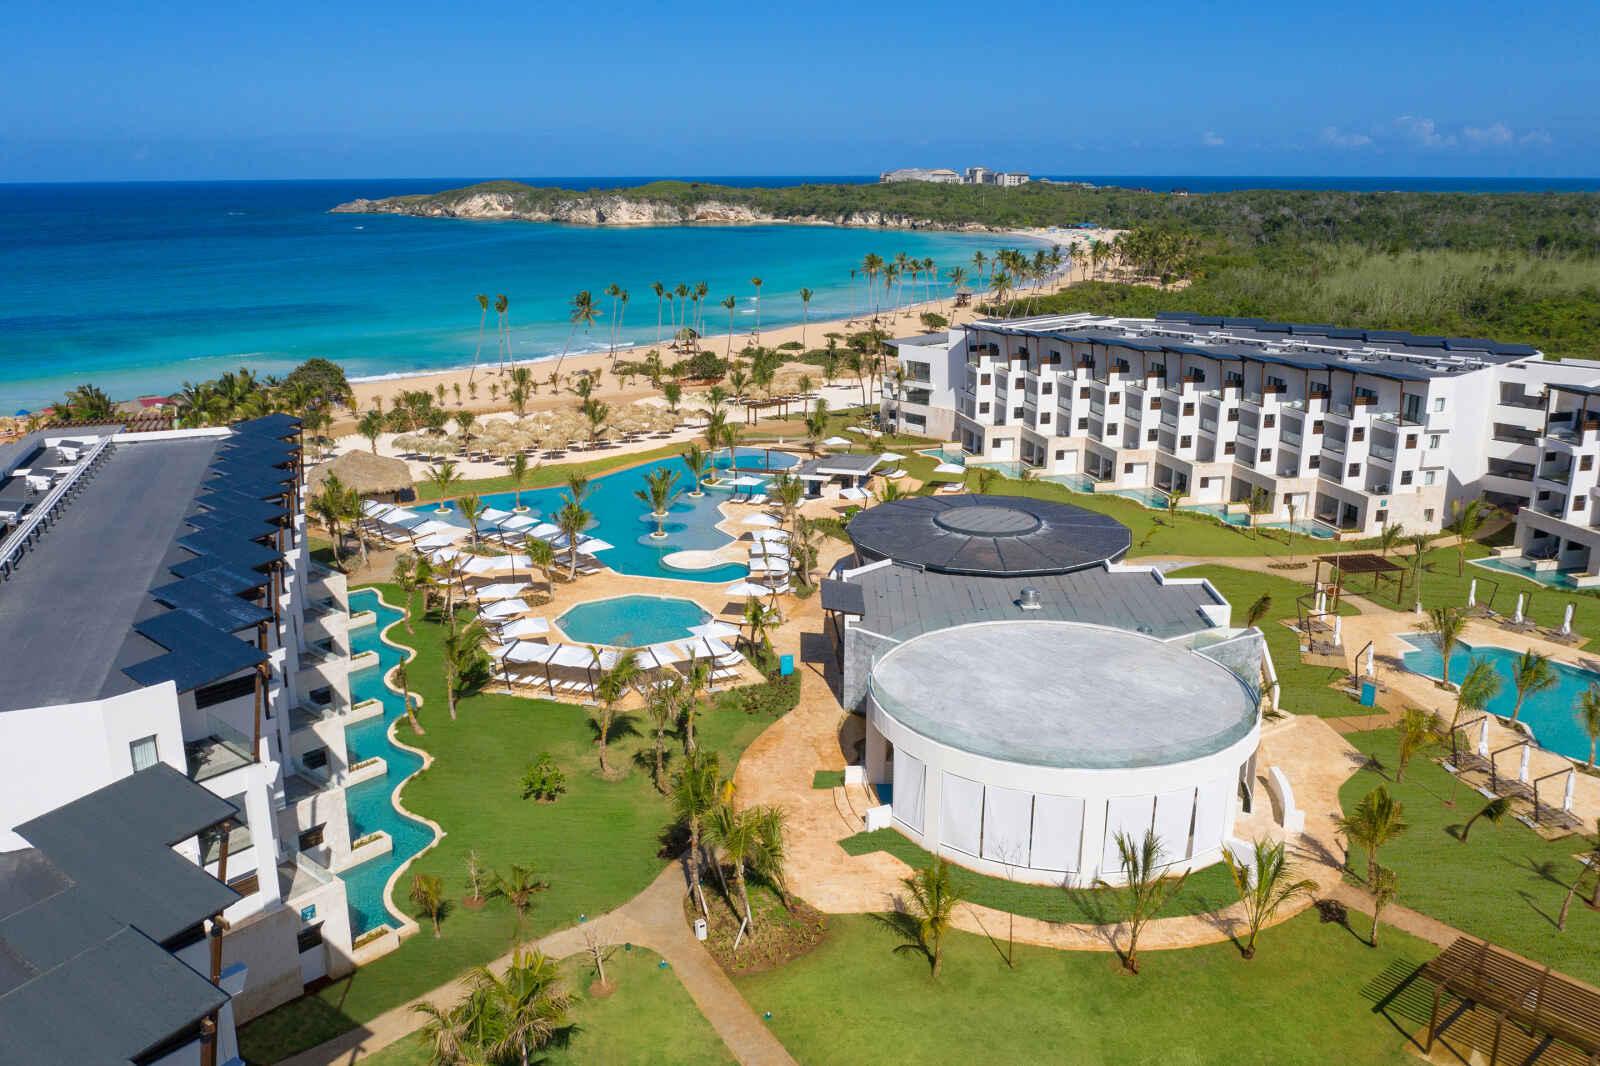 Dreams Macao Beach Punta Cana - 5*